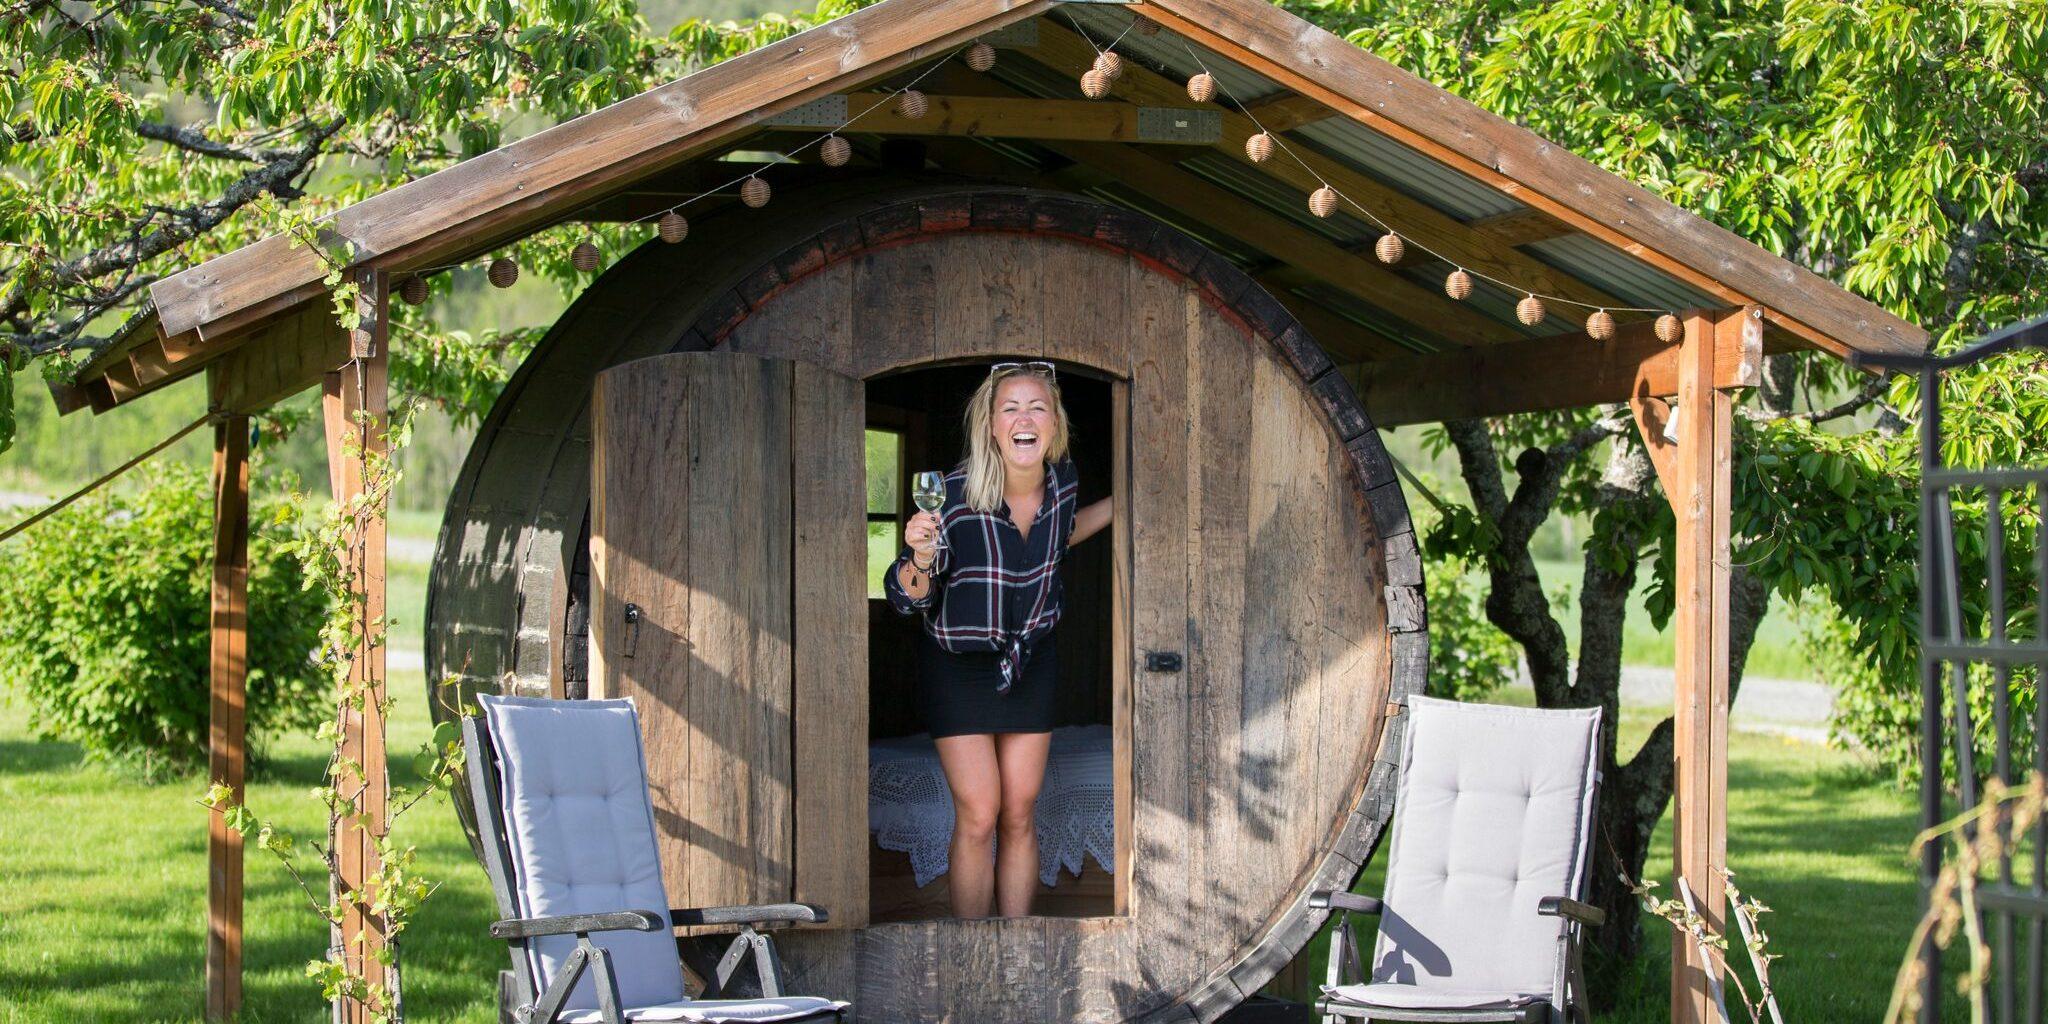 Verdens norligste vingård, Lerkekåsa vingård i Fruktbygda  Gvarv